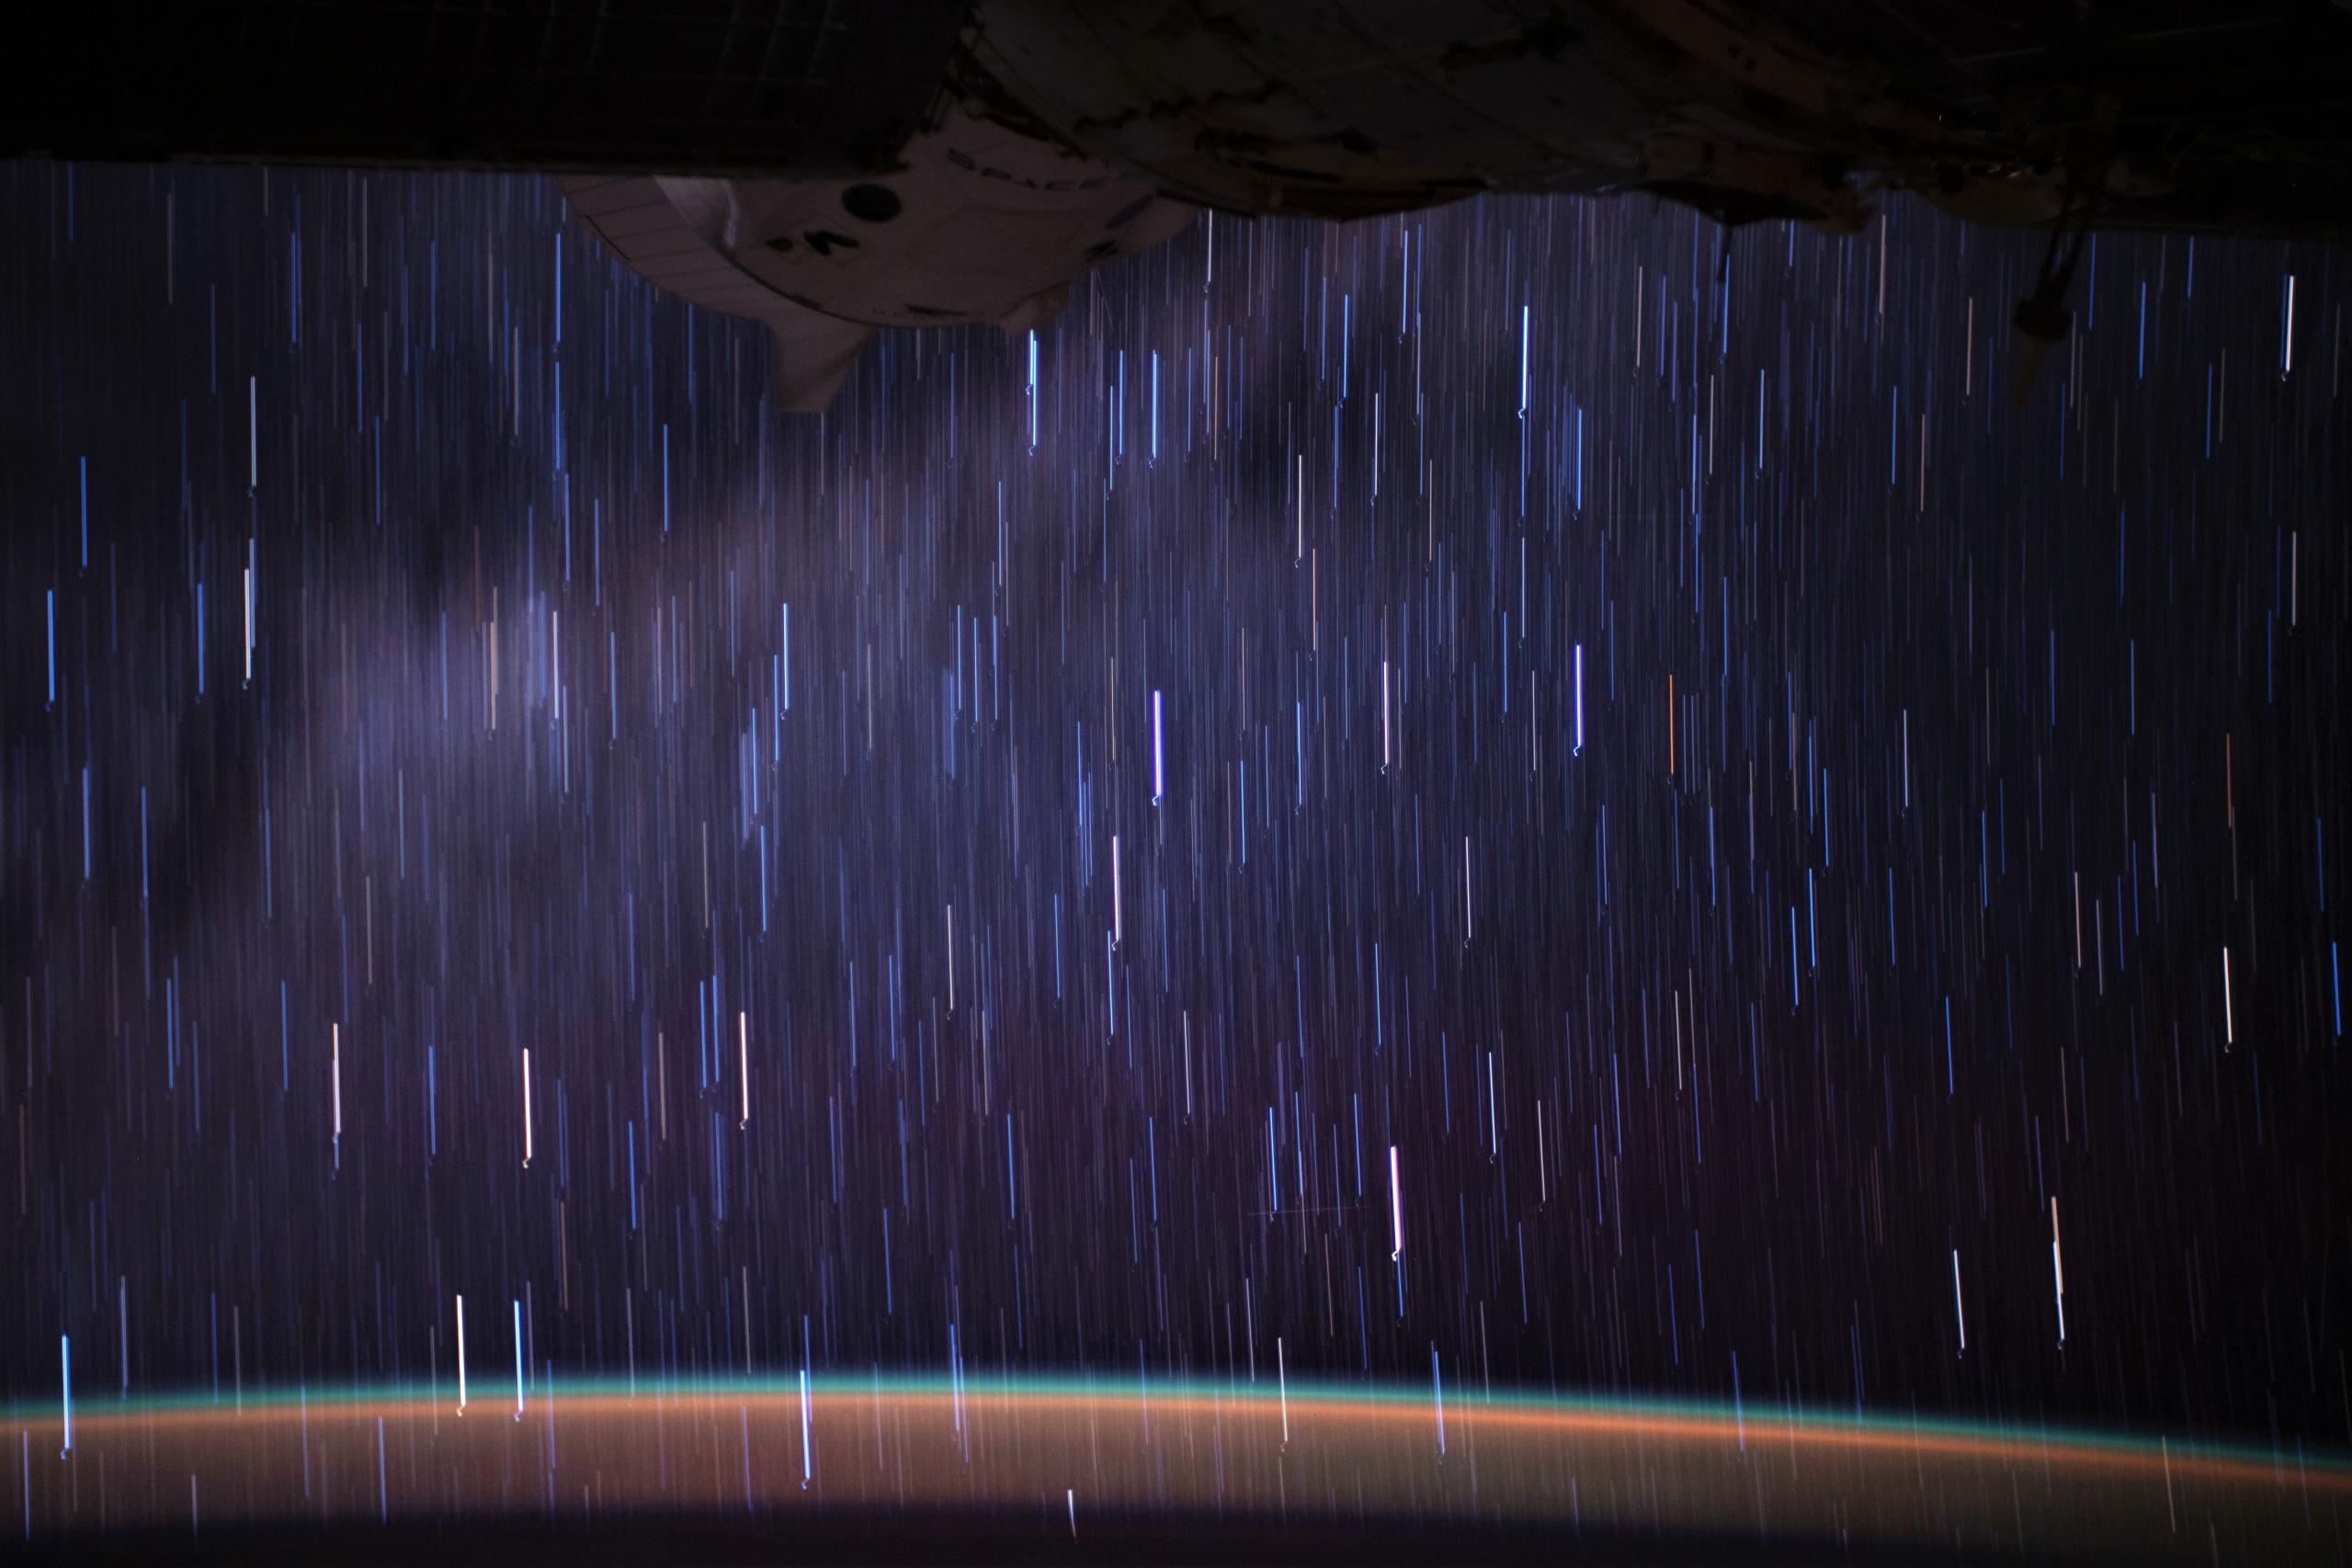 Crew Dragon C207 Crew-1 ISS Jan 2021 (NASA EOL) streak 2 (c)